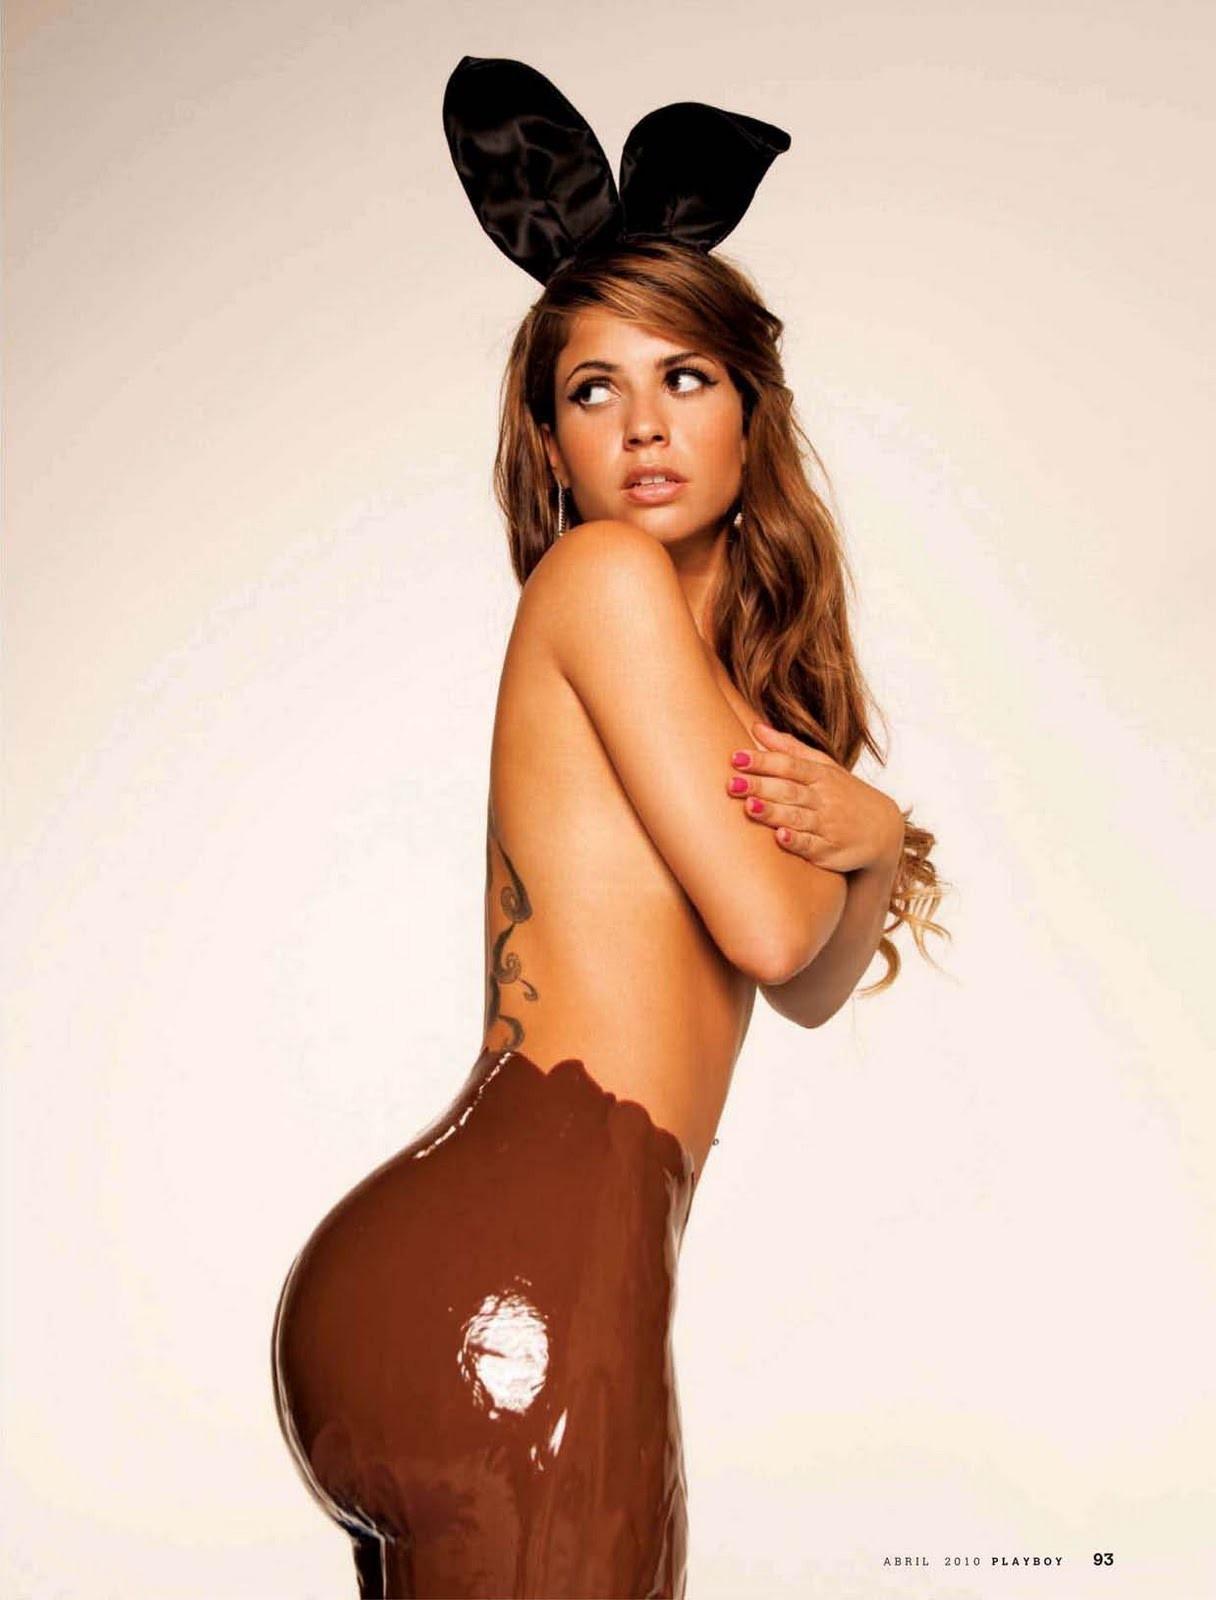 Pokimane deep fake porn playboy bunny